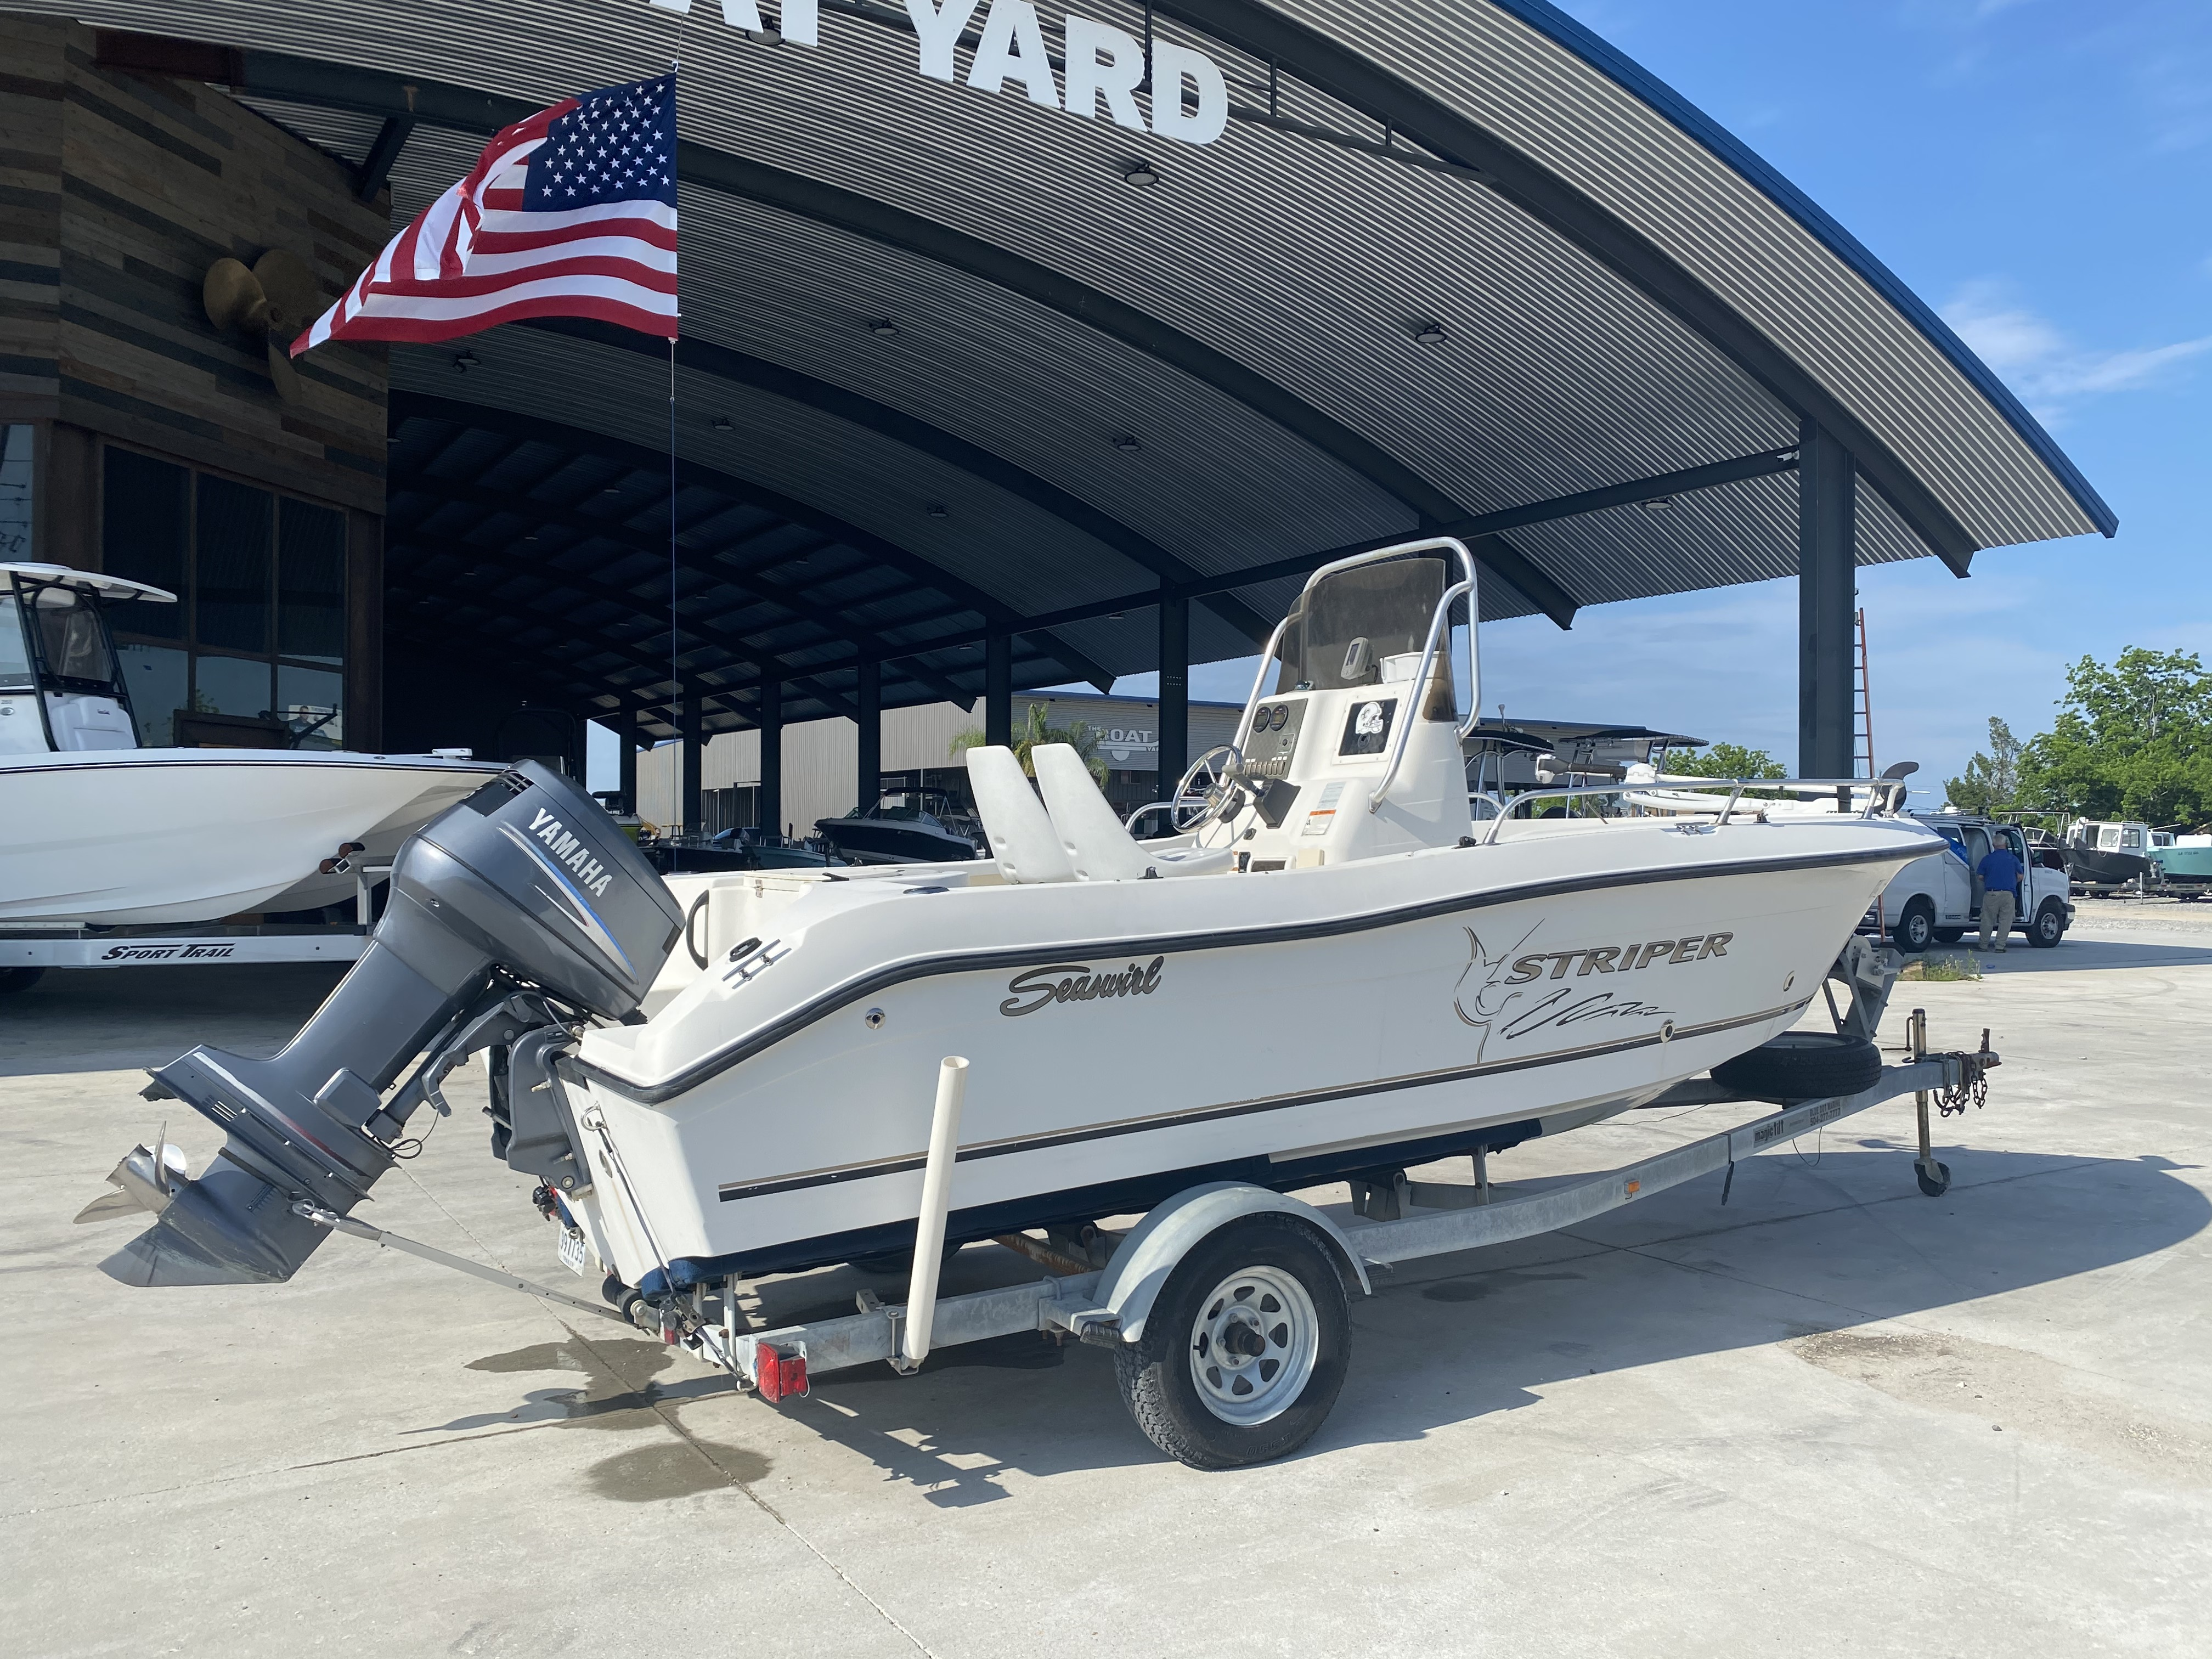 2004 Seaswirl boat for sale, model of the boat is 186 Striper & Image # 10 of 12